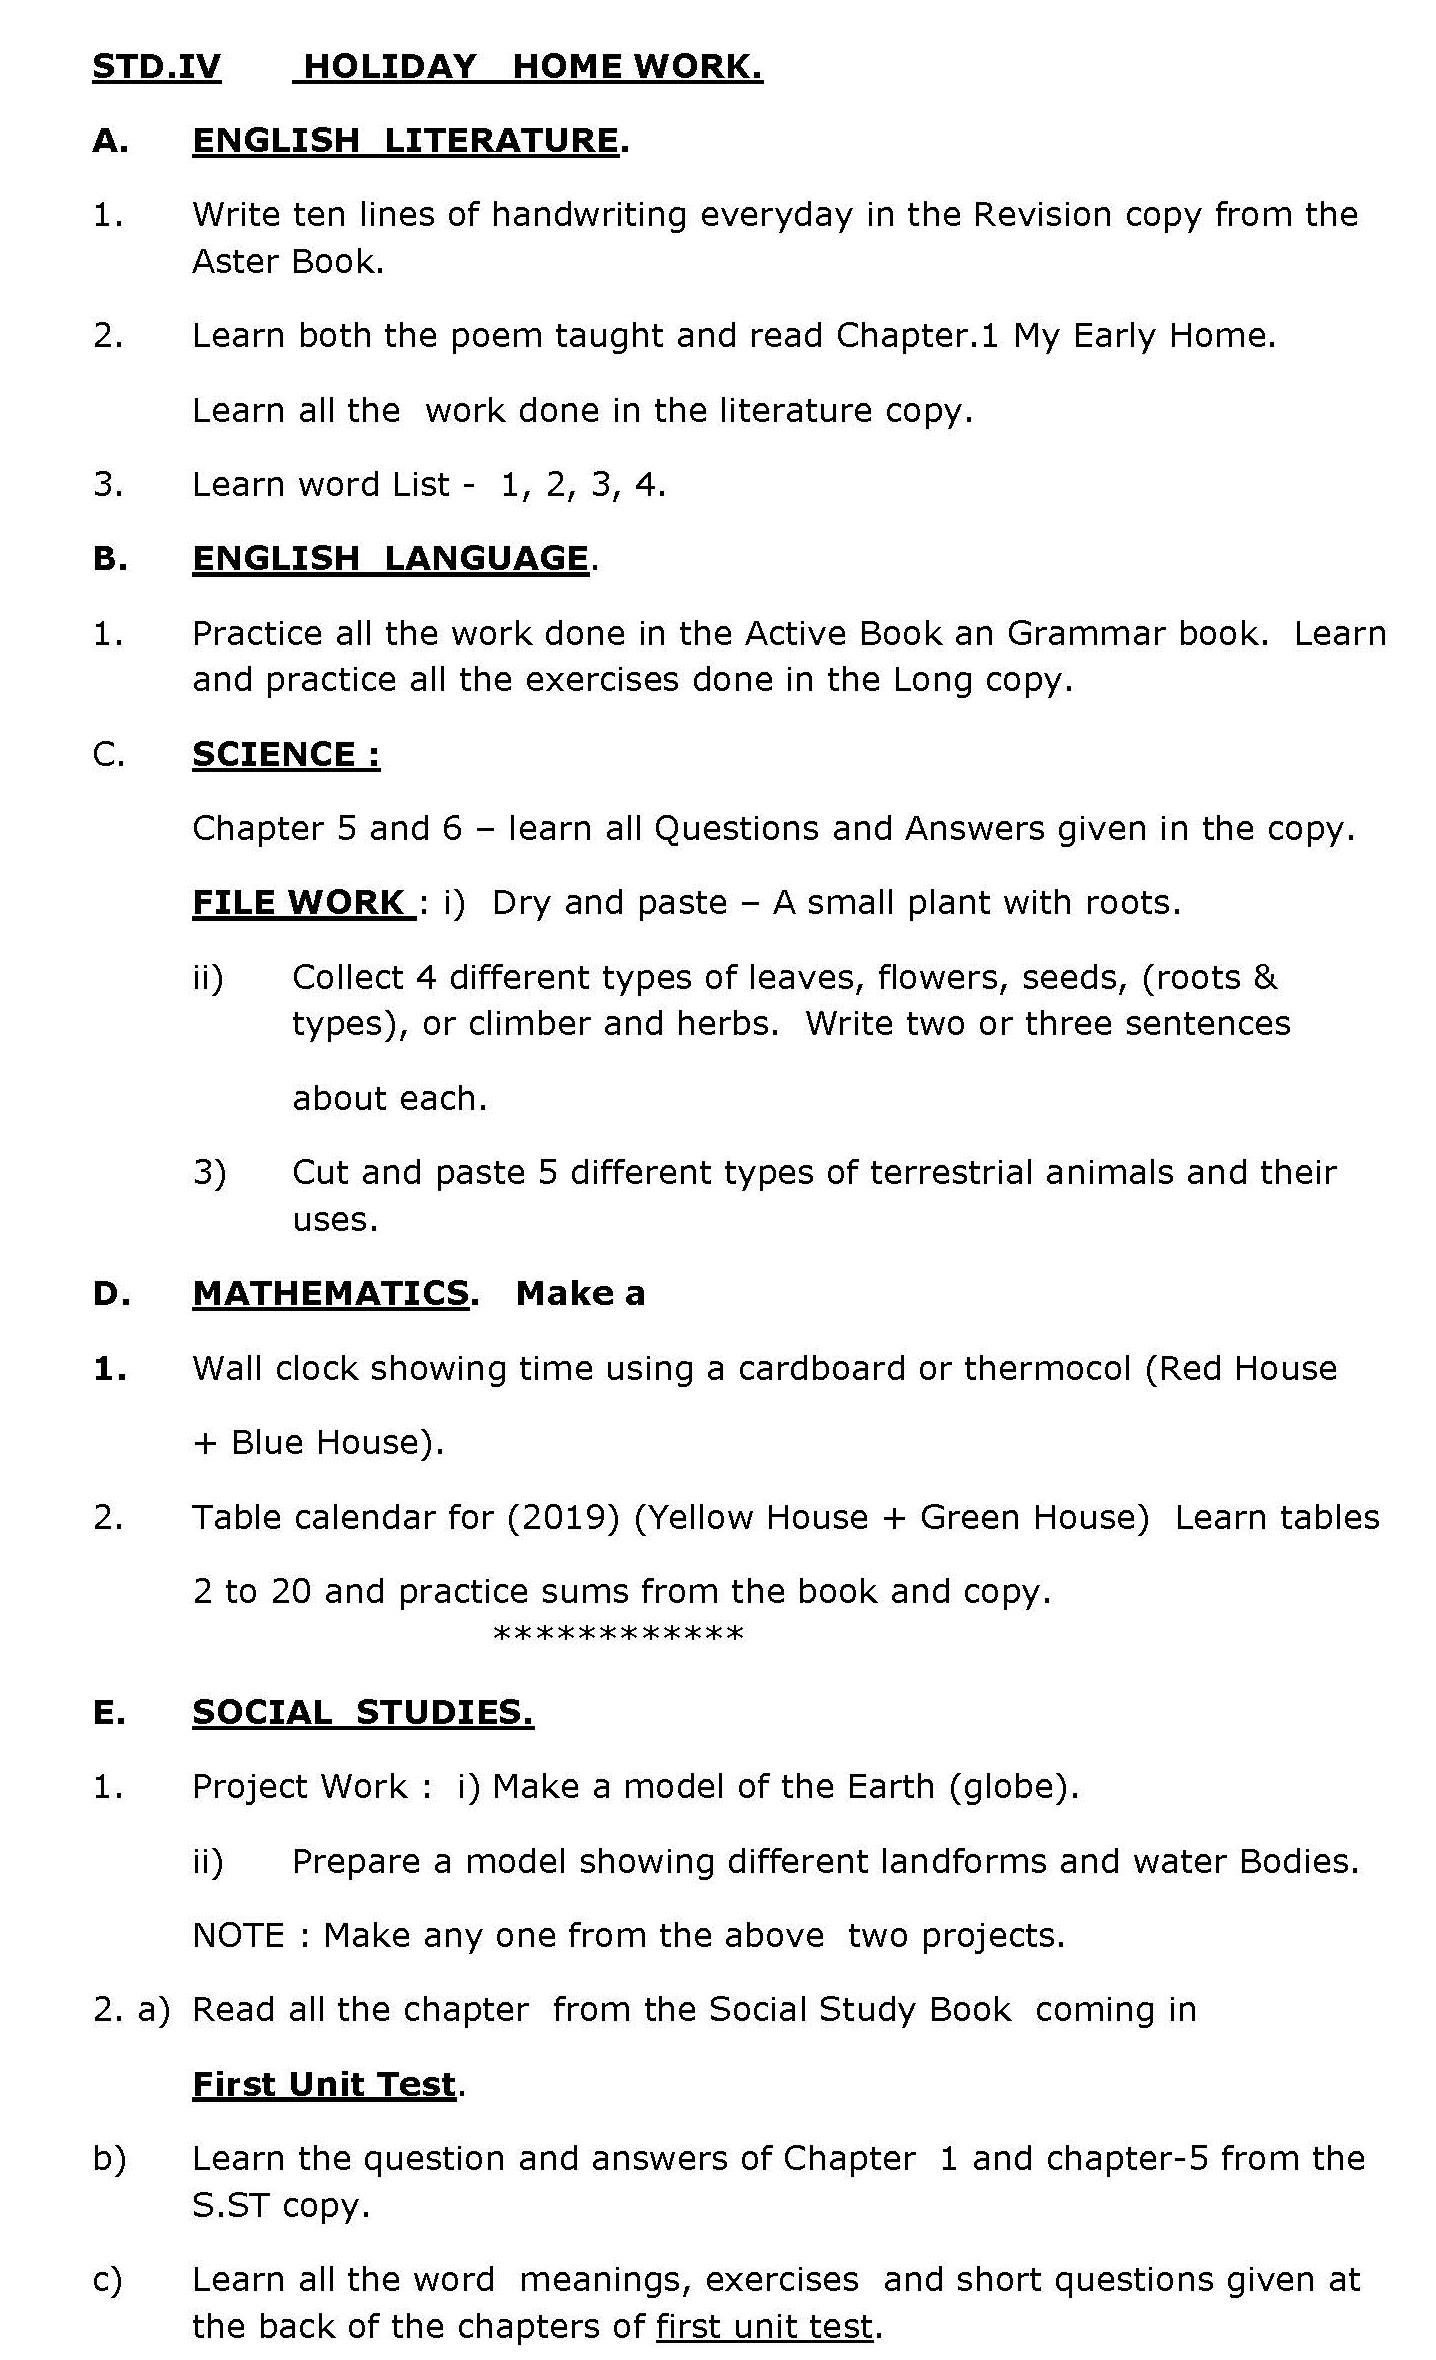 Holiday Homework